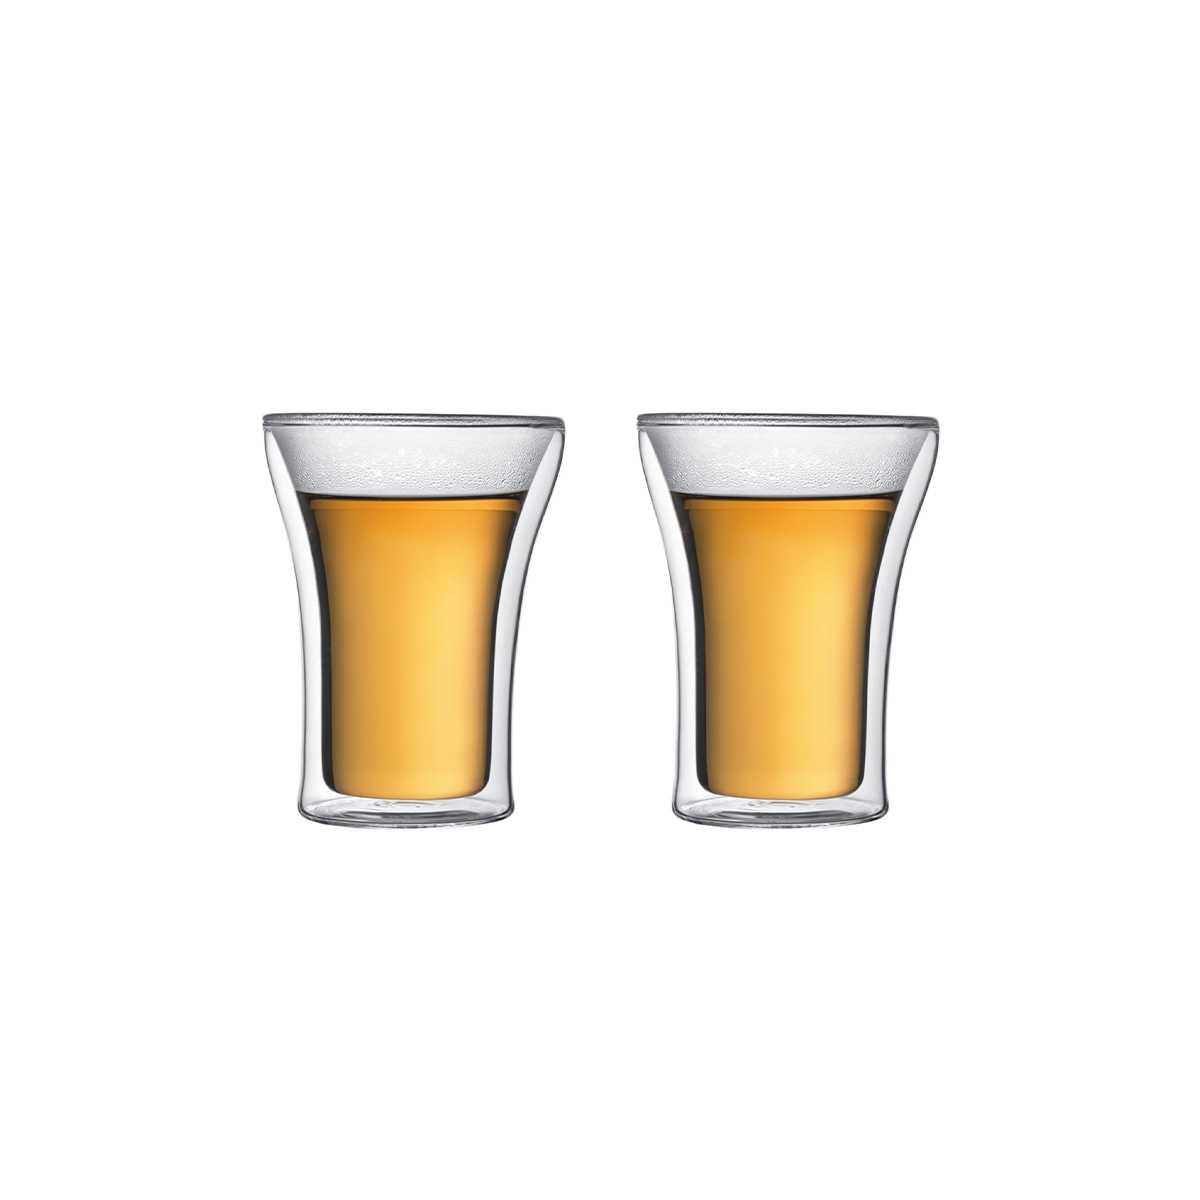 Набор термо-стаканов 0,25 л, 2 шт Bodum Assam  (4556-10) Bodum 4556-10 фото 1